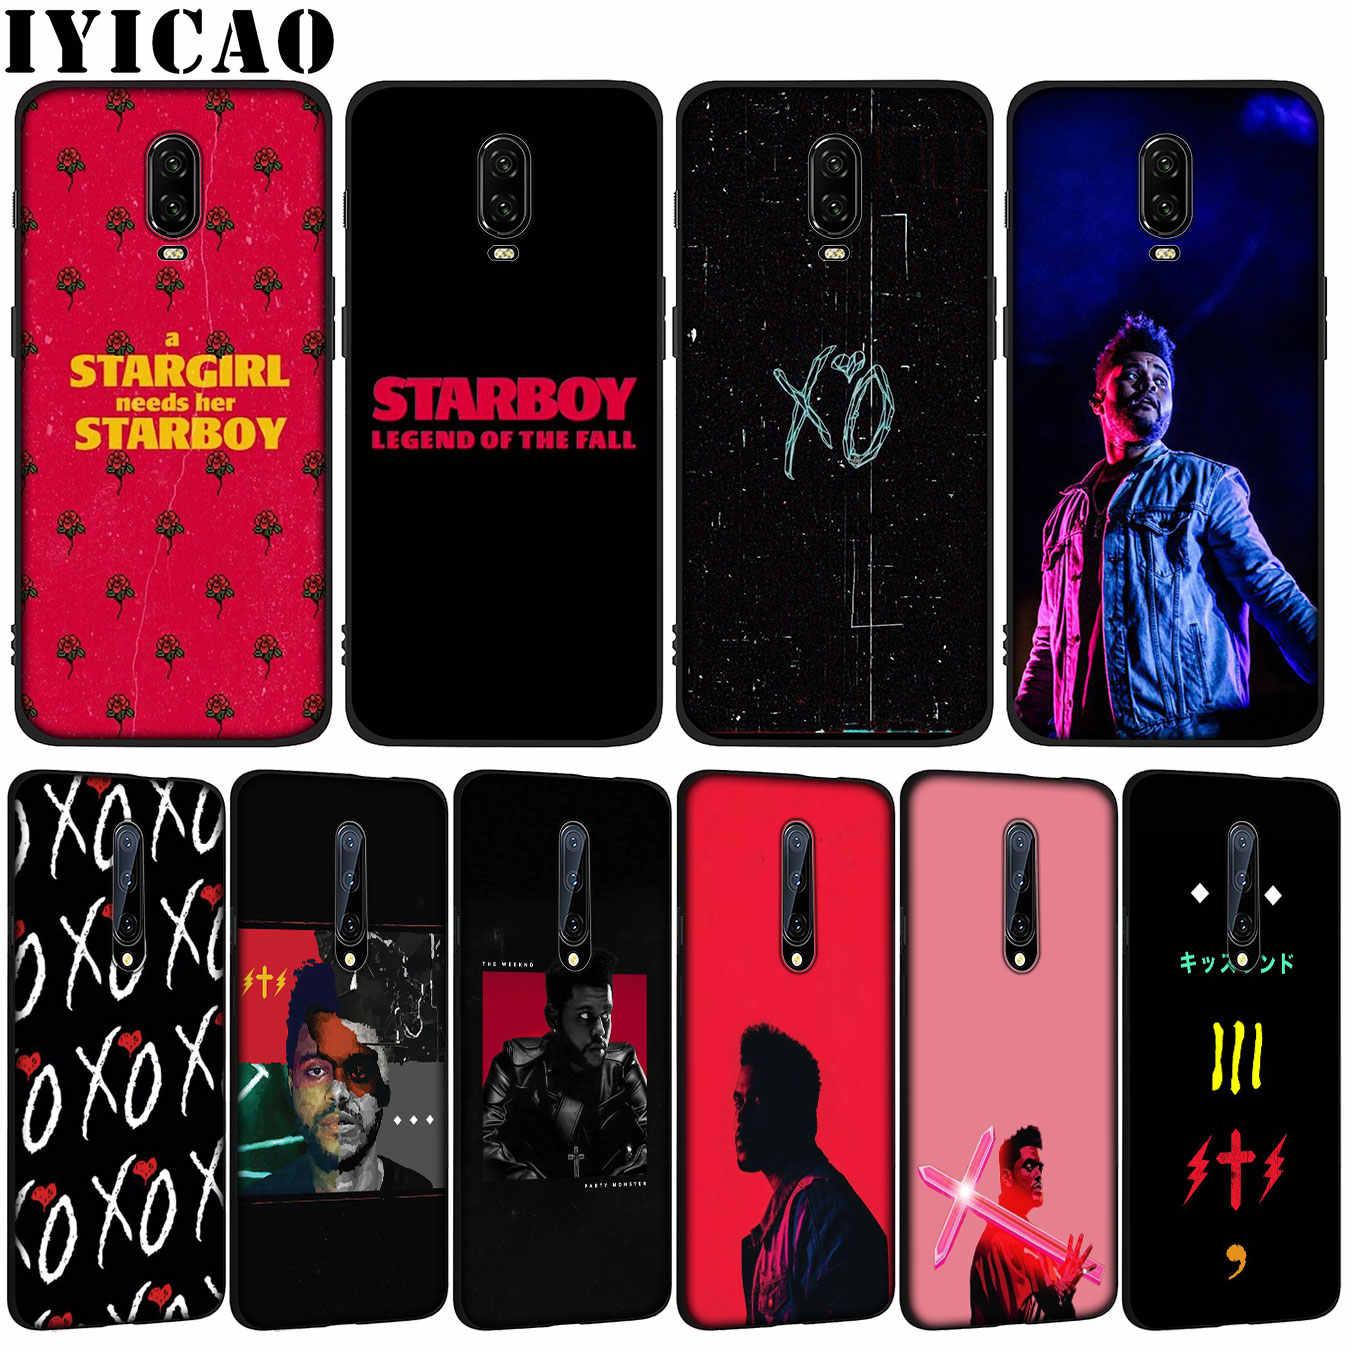 Funda de teléfono de silicona negra de TPU suave rapero Weeknd para OnePlus 7T 7 Pro 6 6T 5 5T One Plus 7Pro